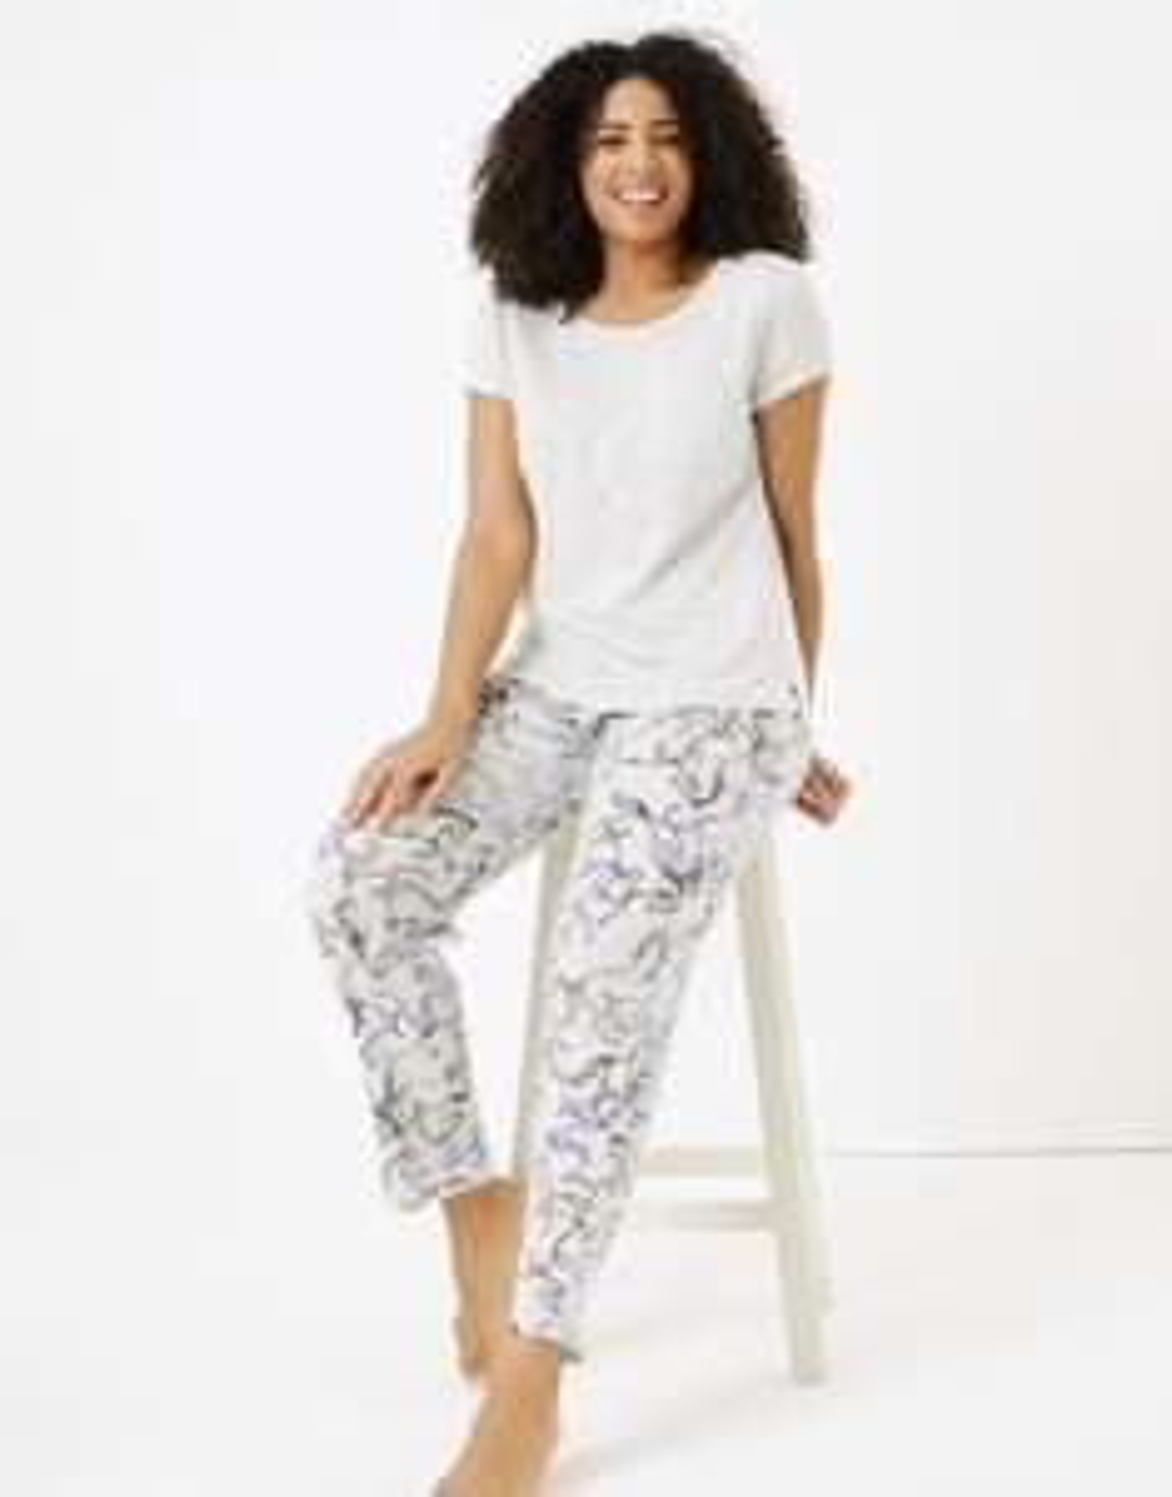 M&S Ladies Horse pyjamas set for £1.49 instore at Marks & Spencer Gyle Edinburgh